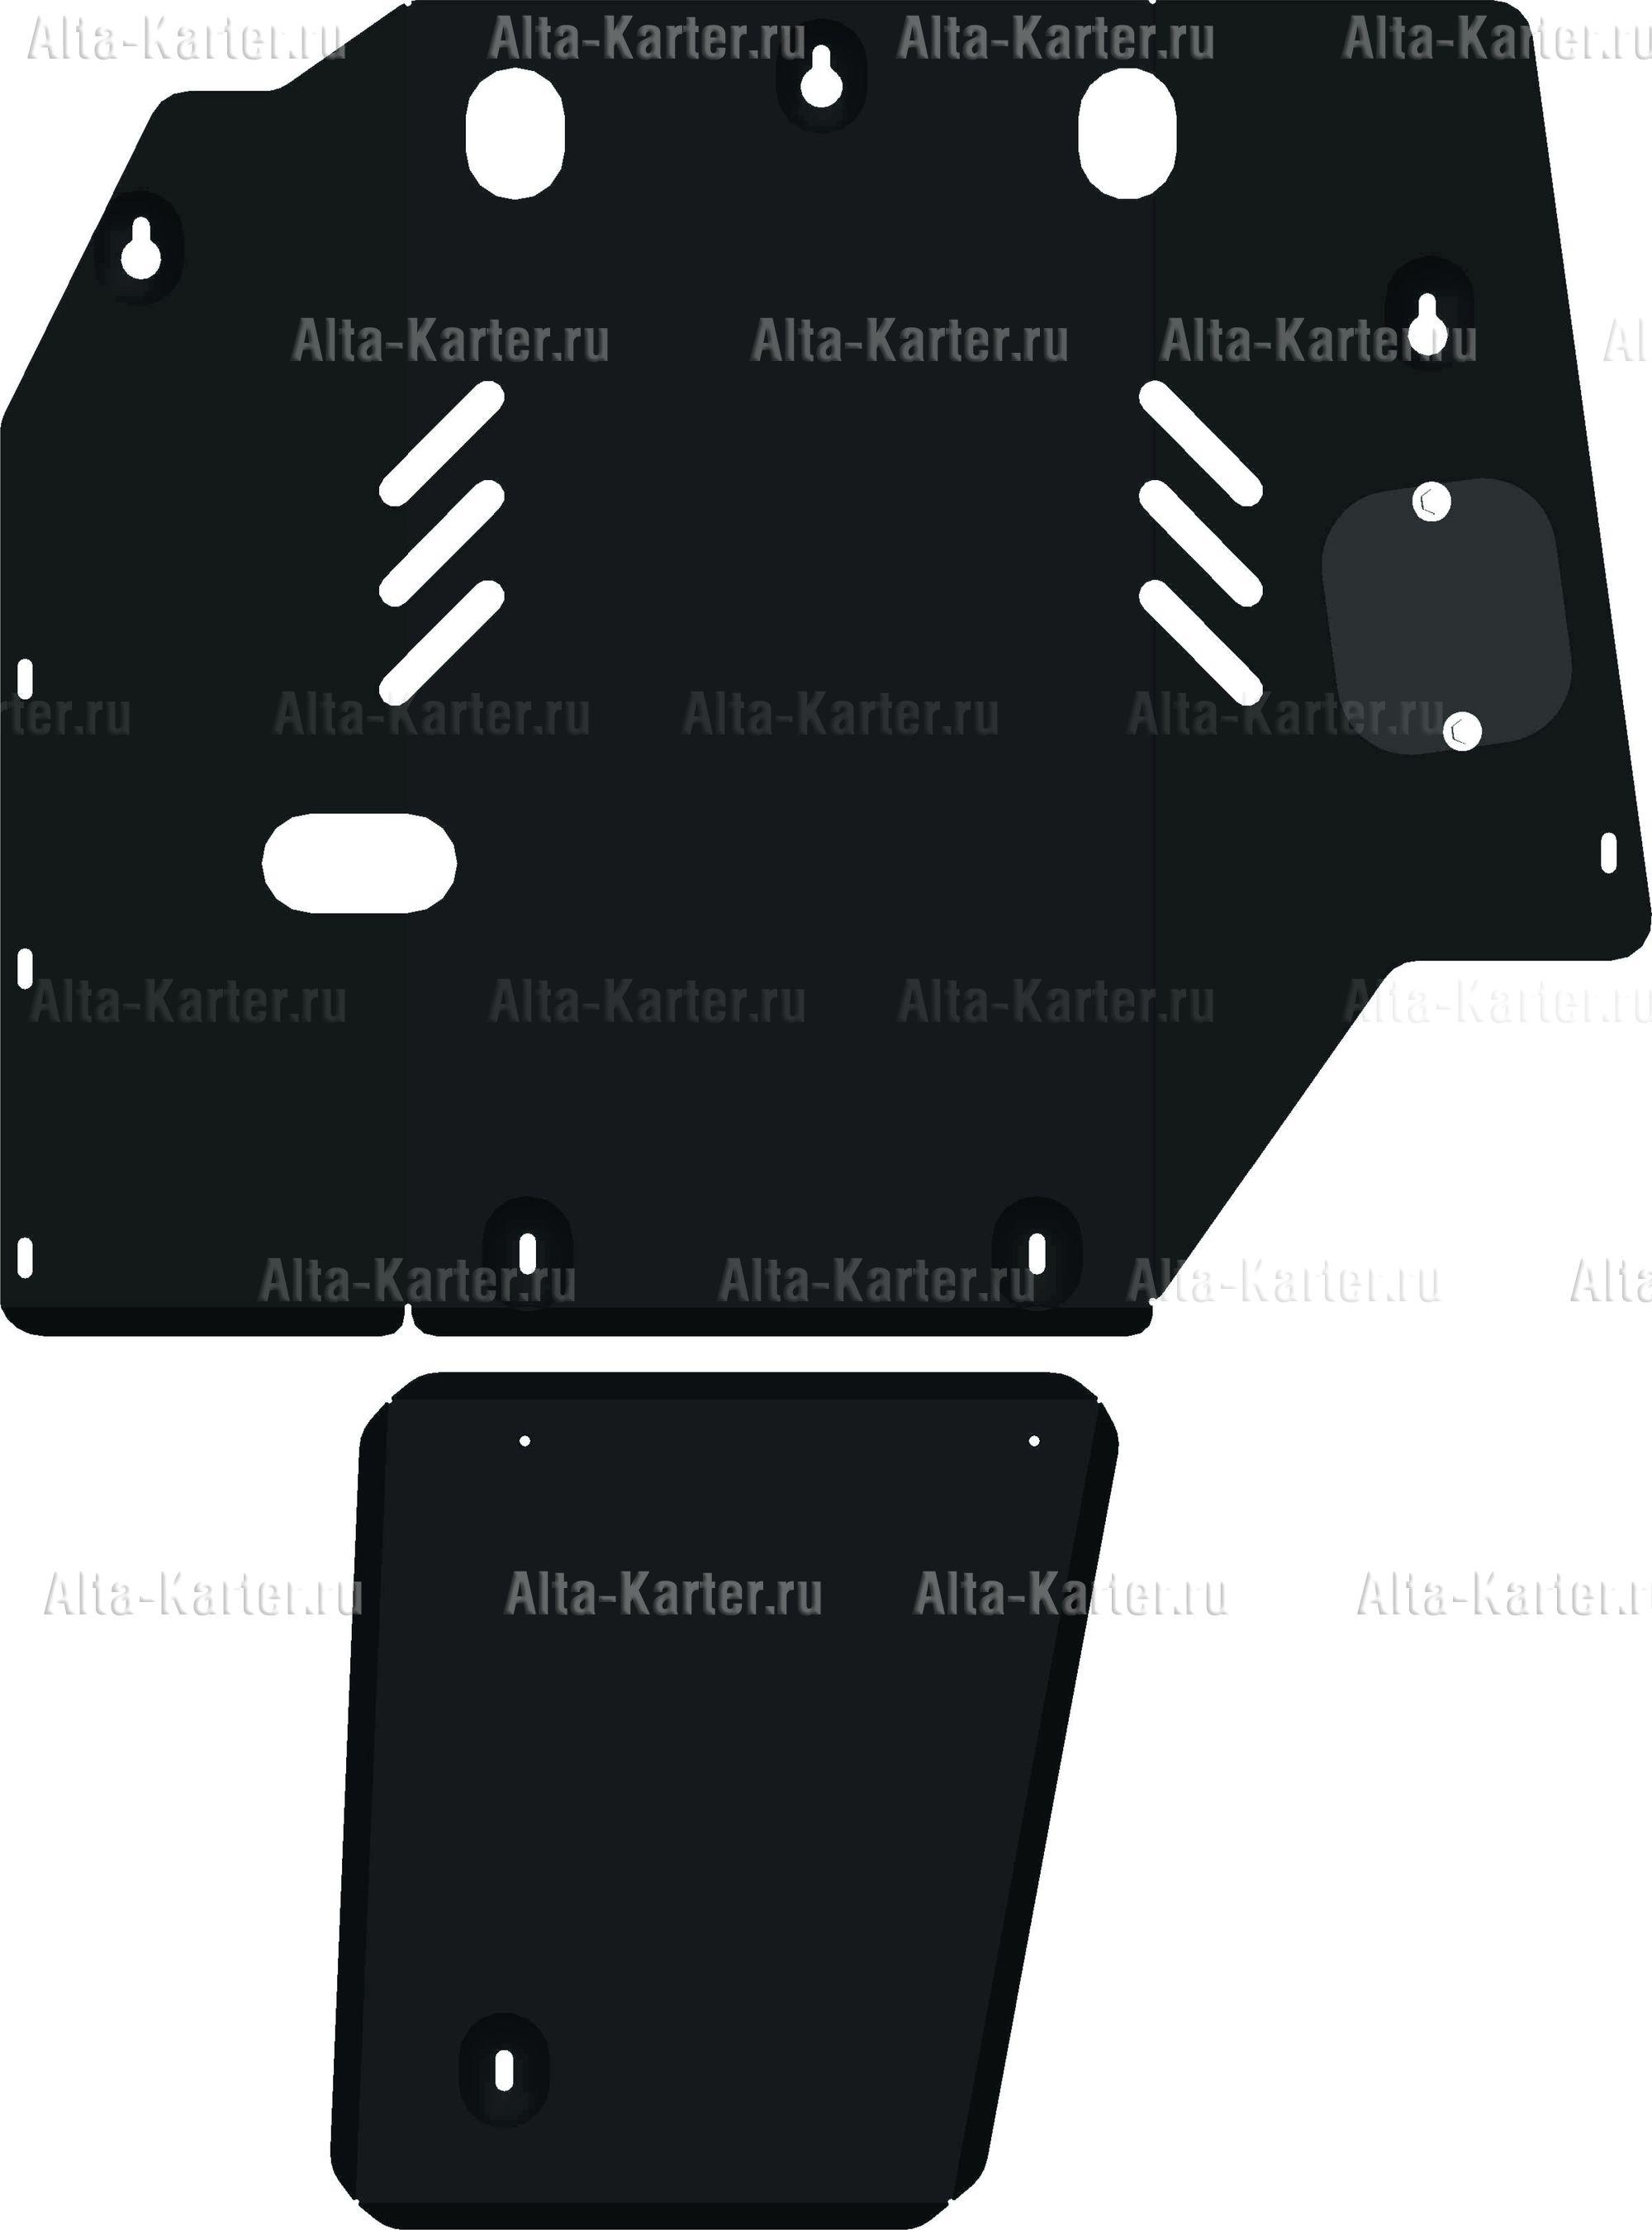 Защита Alfeco для картера и КПП Toyota Estima I Lucida 1990-2000. Артикул ALF.24.64